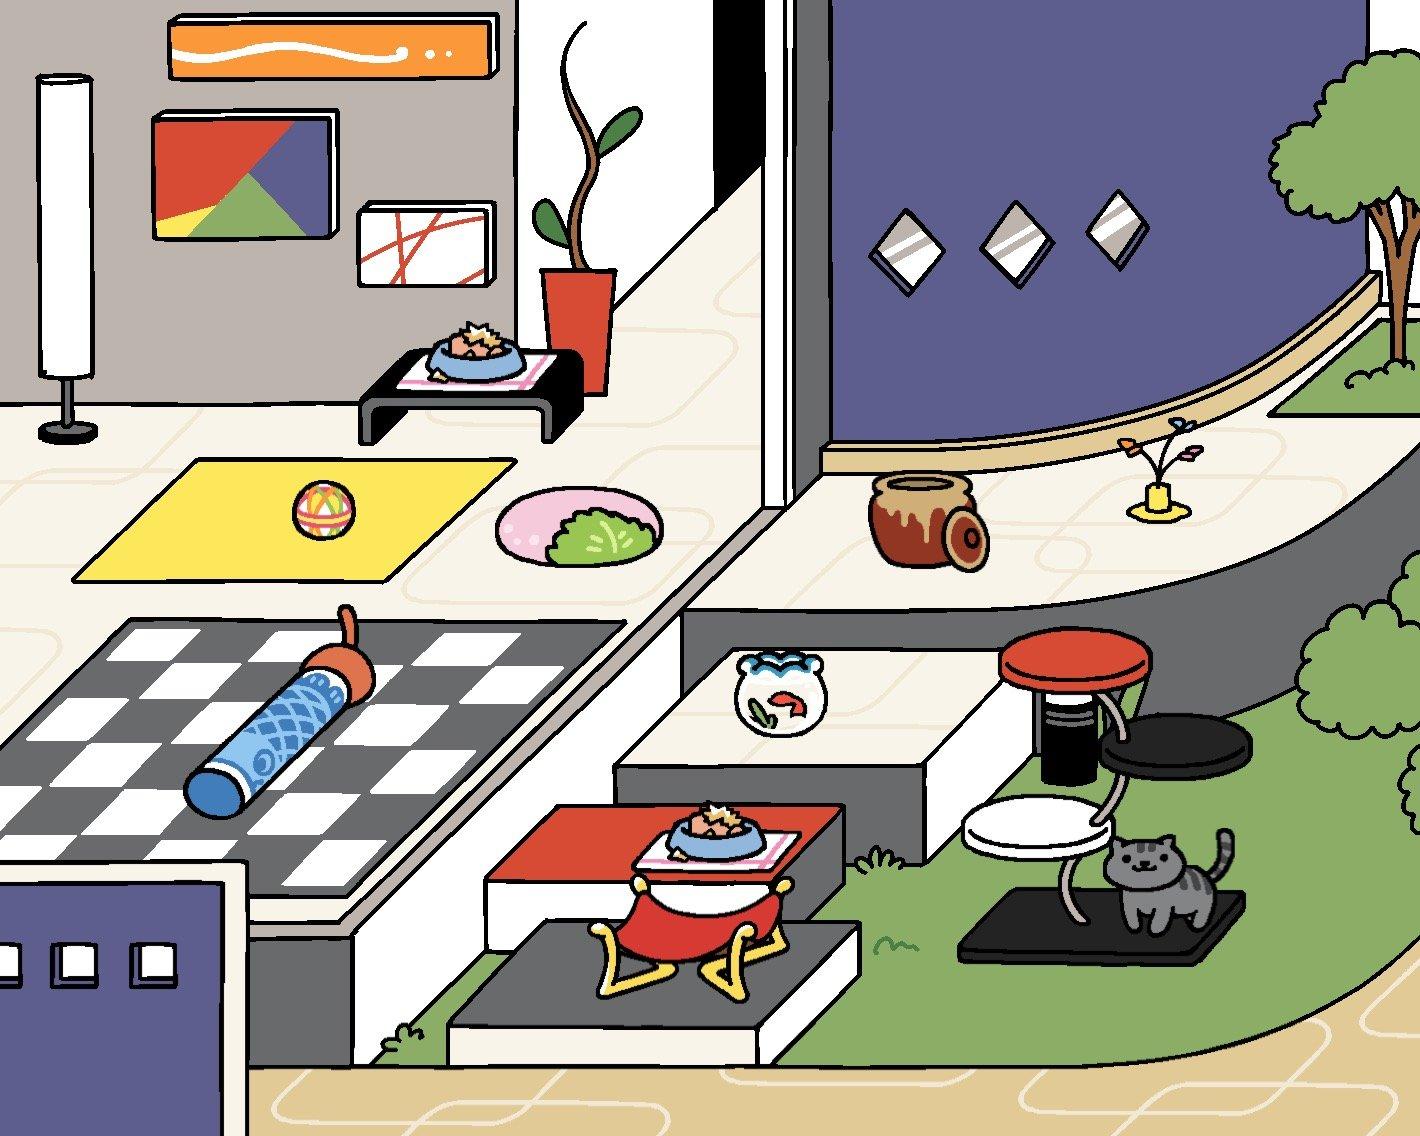 Neko Atsume: Why I'm The Office Cat Lady 1